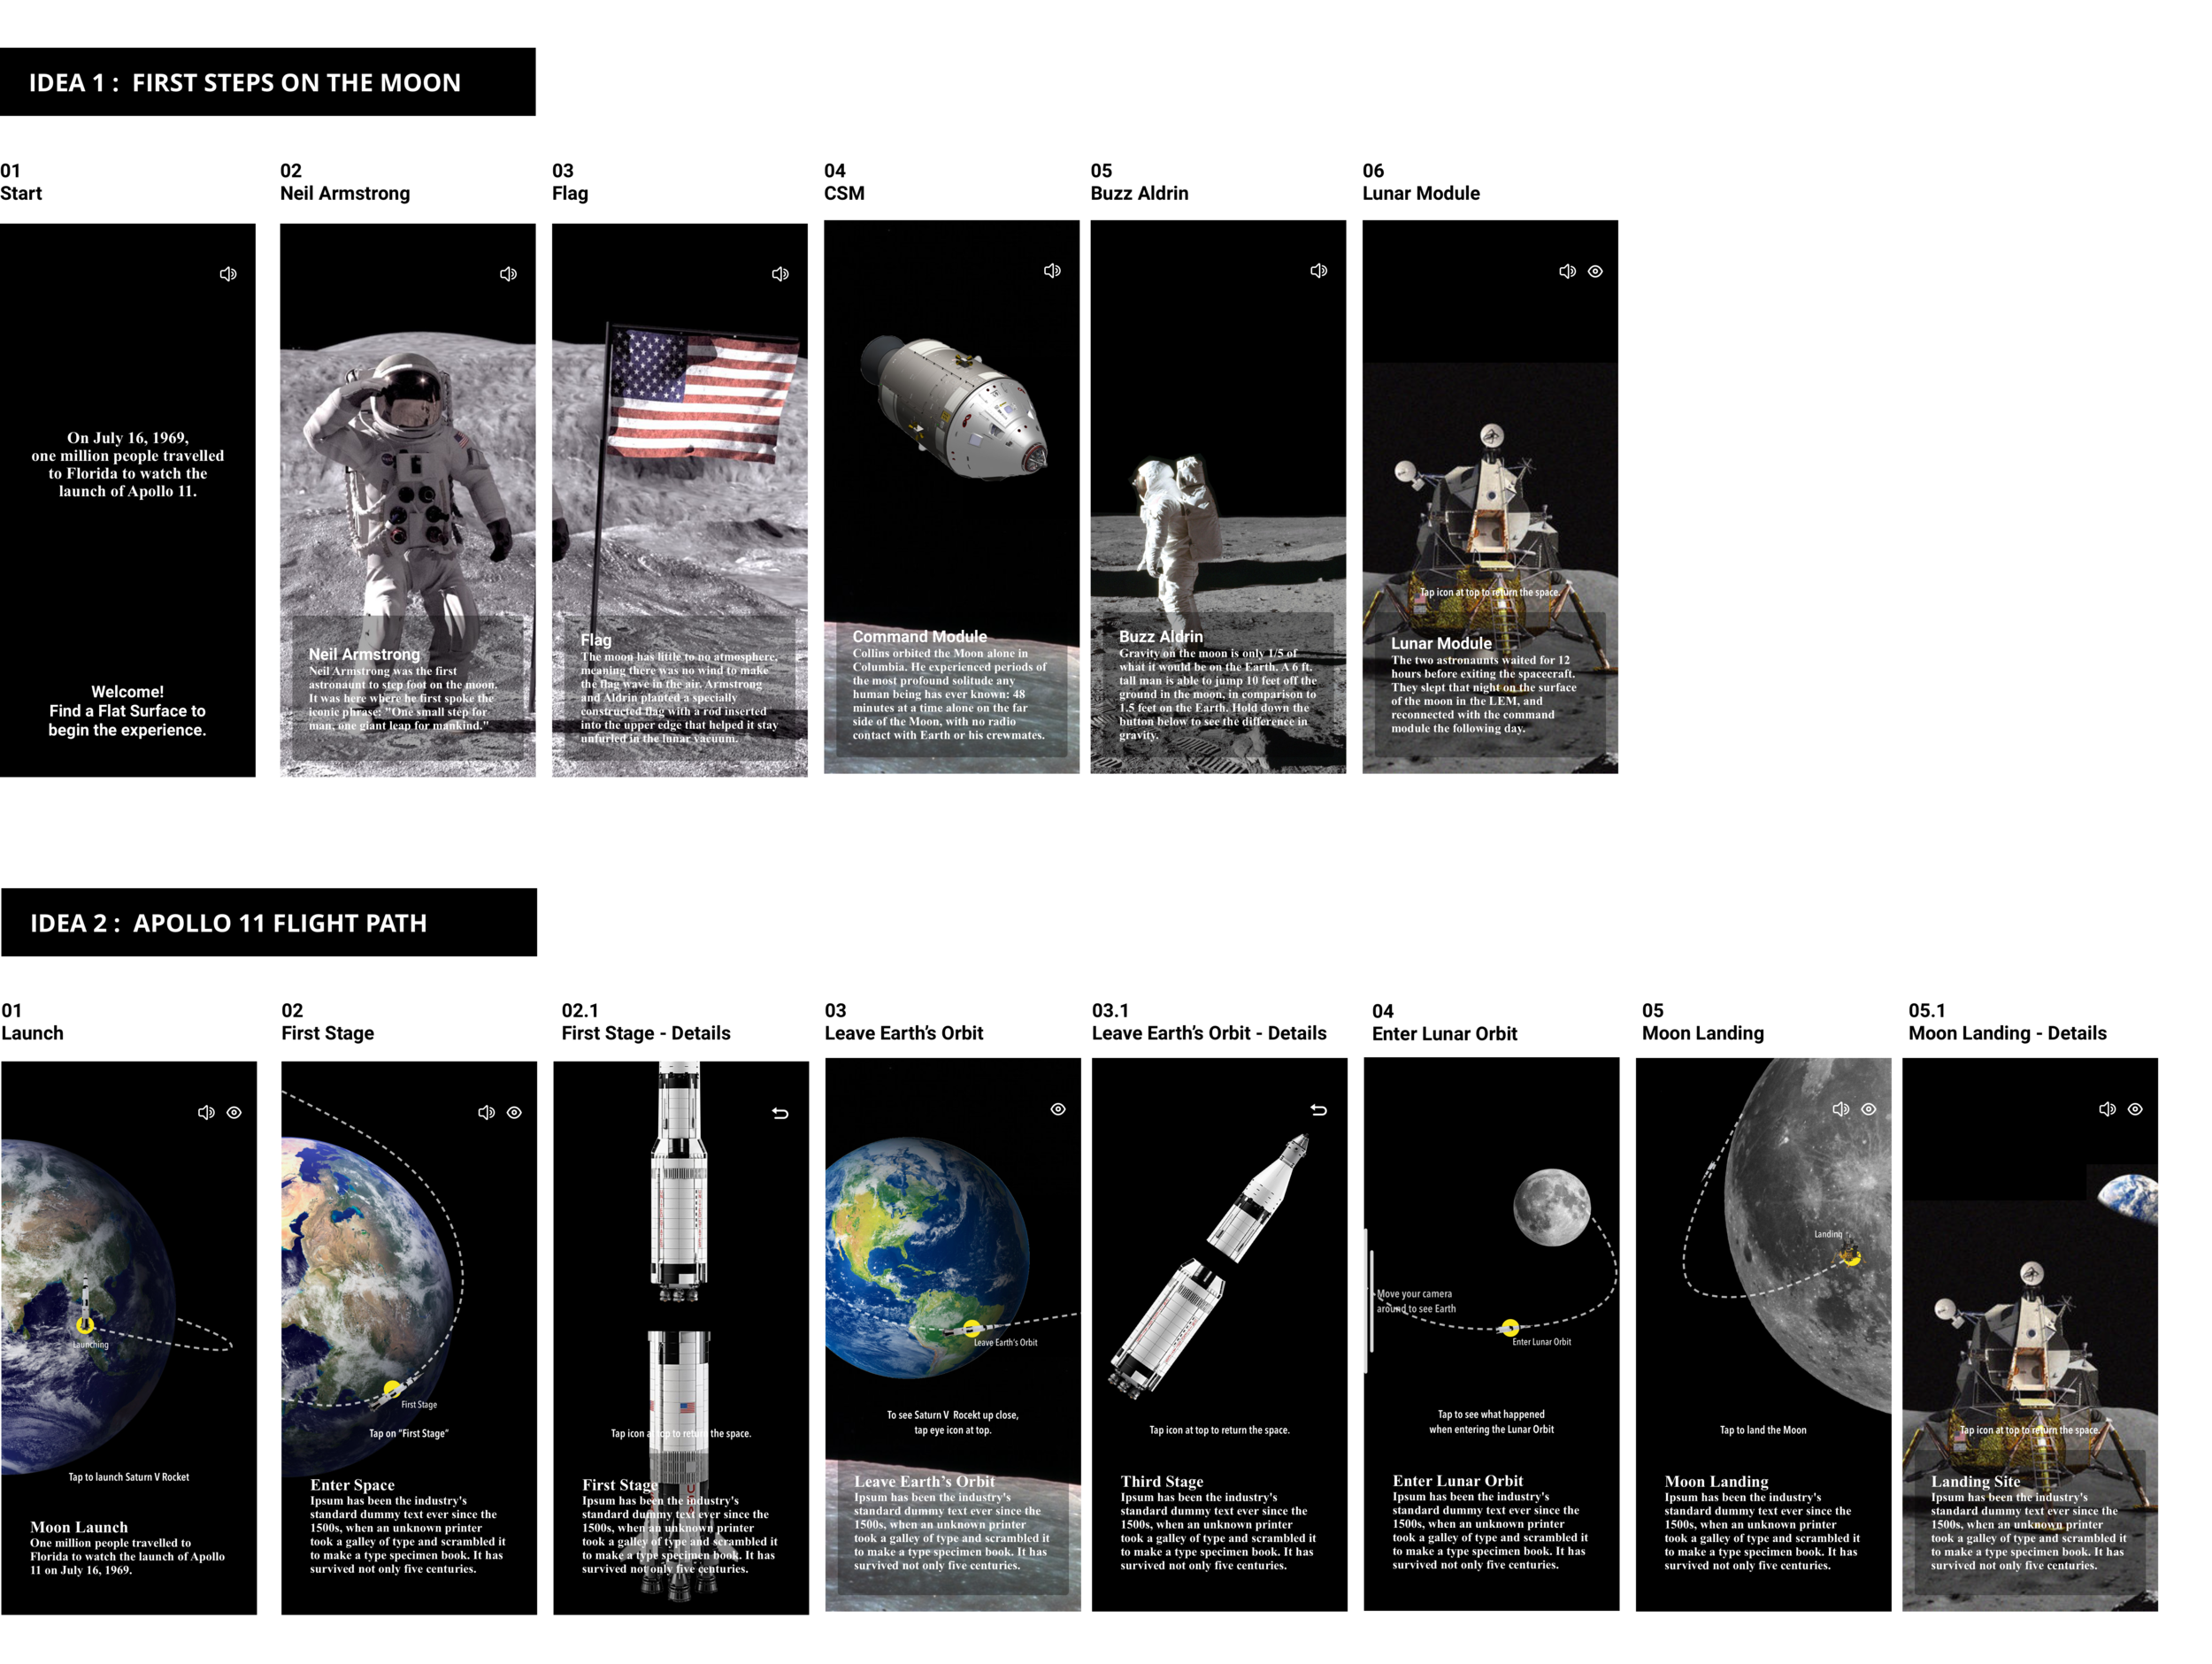 Jennifer_Wei_Associated_Press_NYC_Media_Lab_Apollo11_Moon_Mission_Flight_Path_Wireframes.png